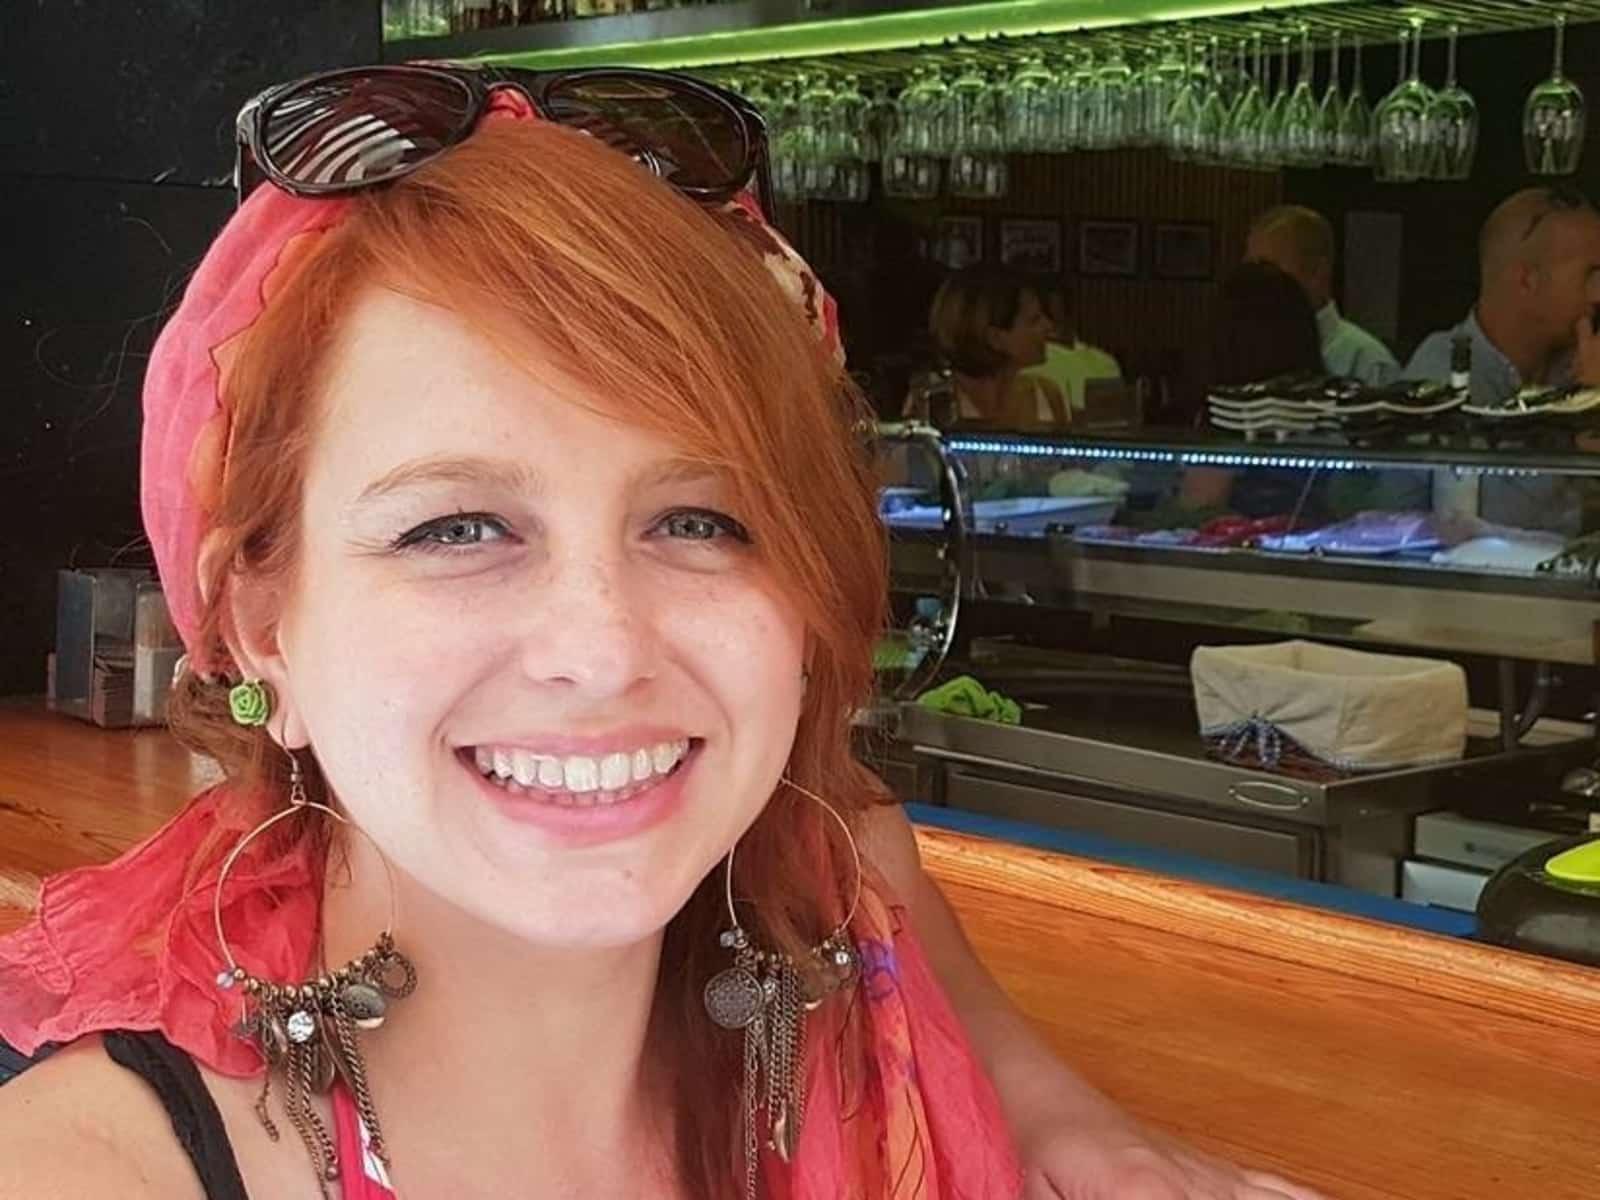 Katie from Perth, Western Australia, Australia